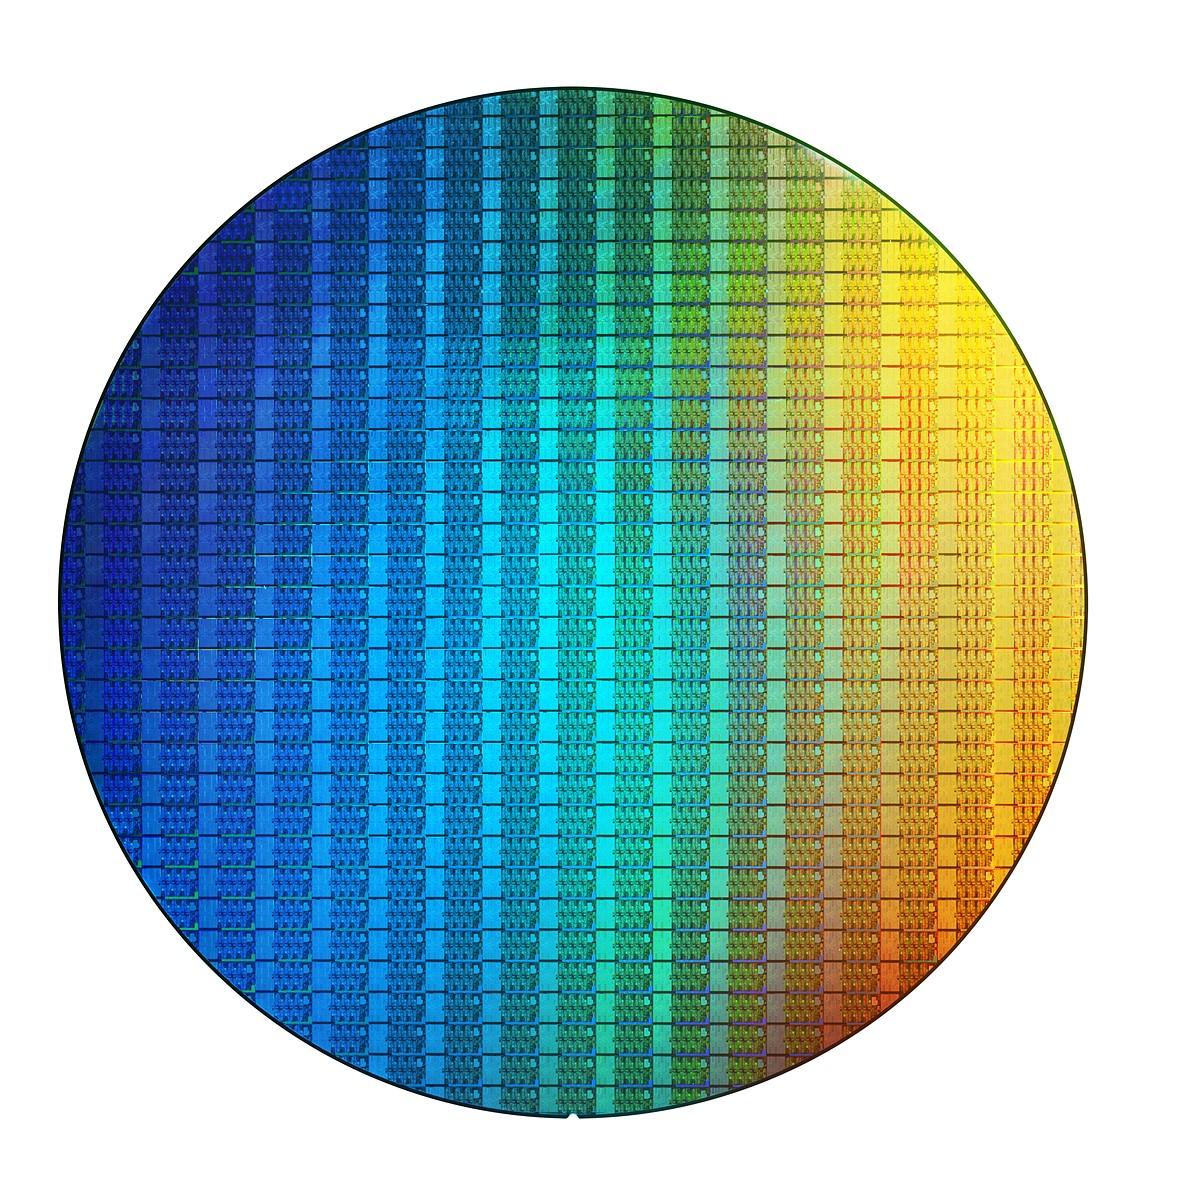 Intel's 8th generation desktop CPUs can edit 4K 360-degree video 32